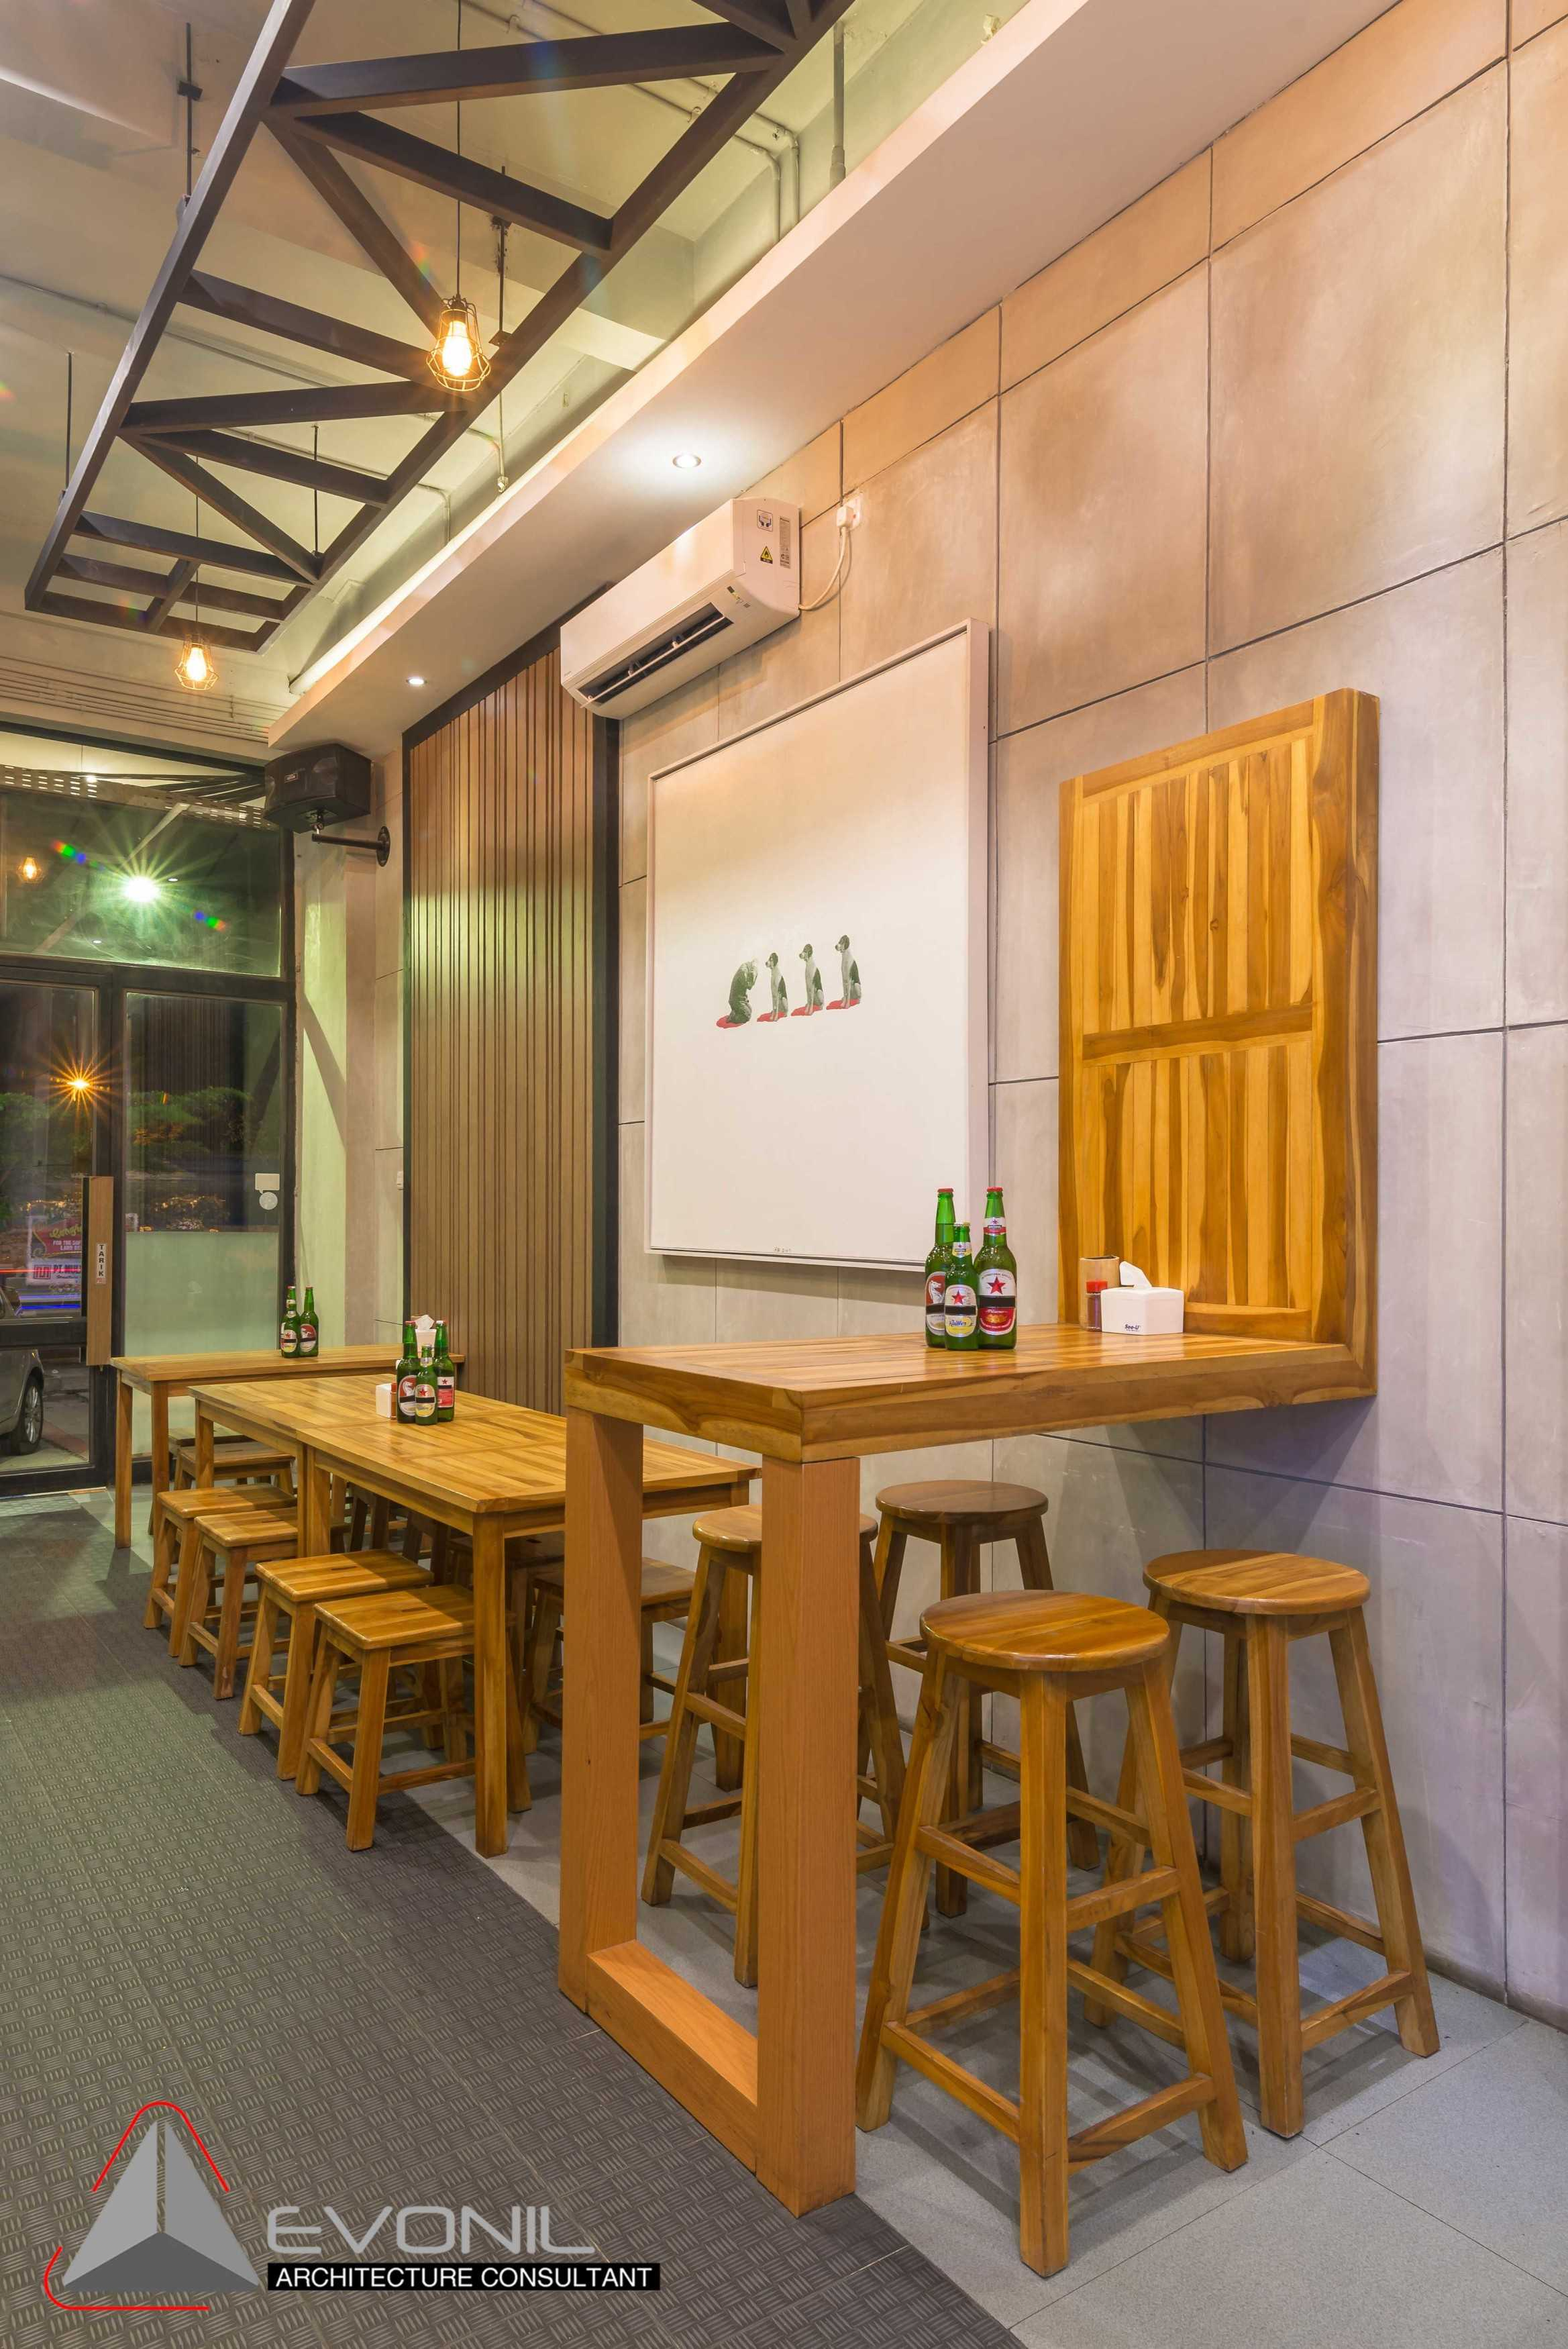 Evonil Architecture Sapeng Art Of Satay Resto P.i.k, Jakarta P.i.k, Jakarta Dining Area Modern  13185